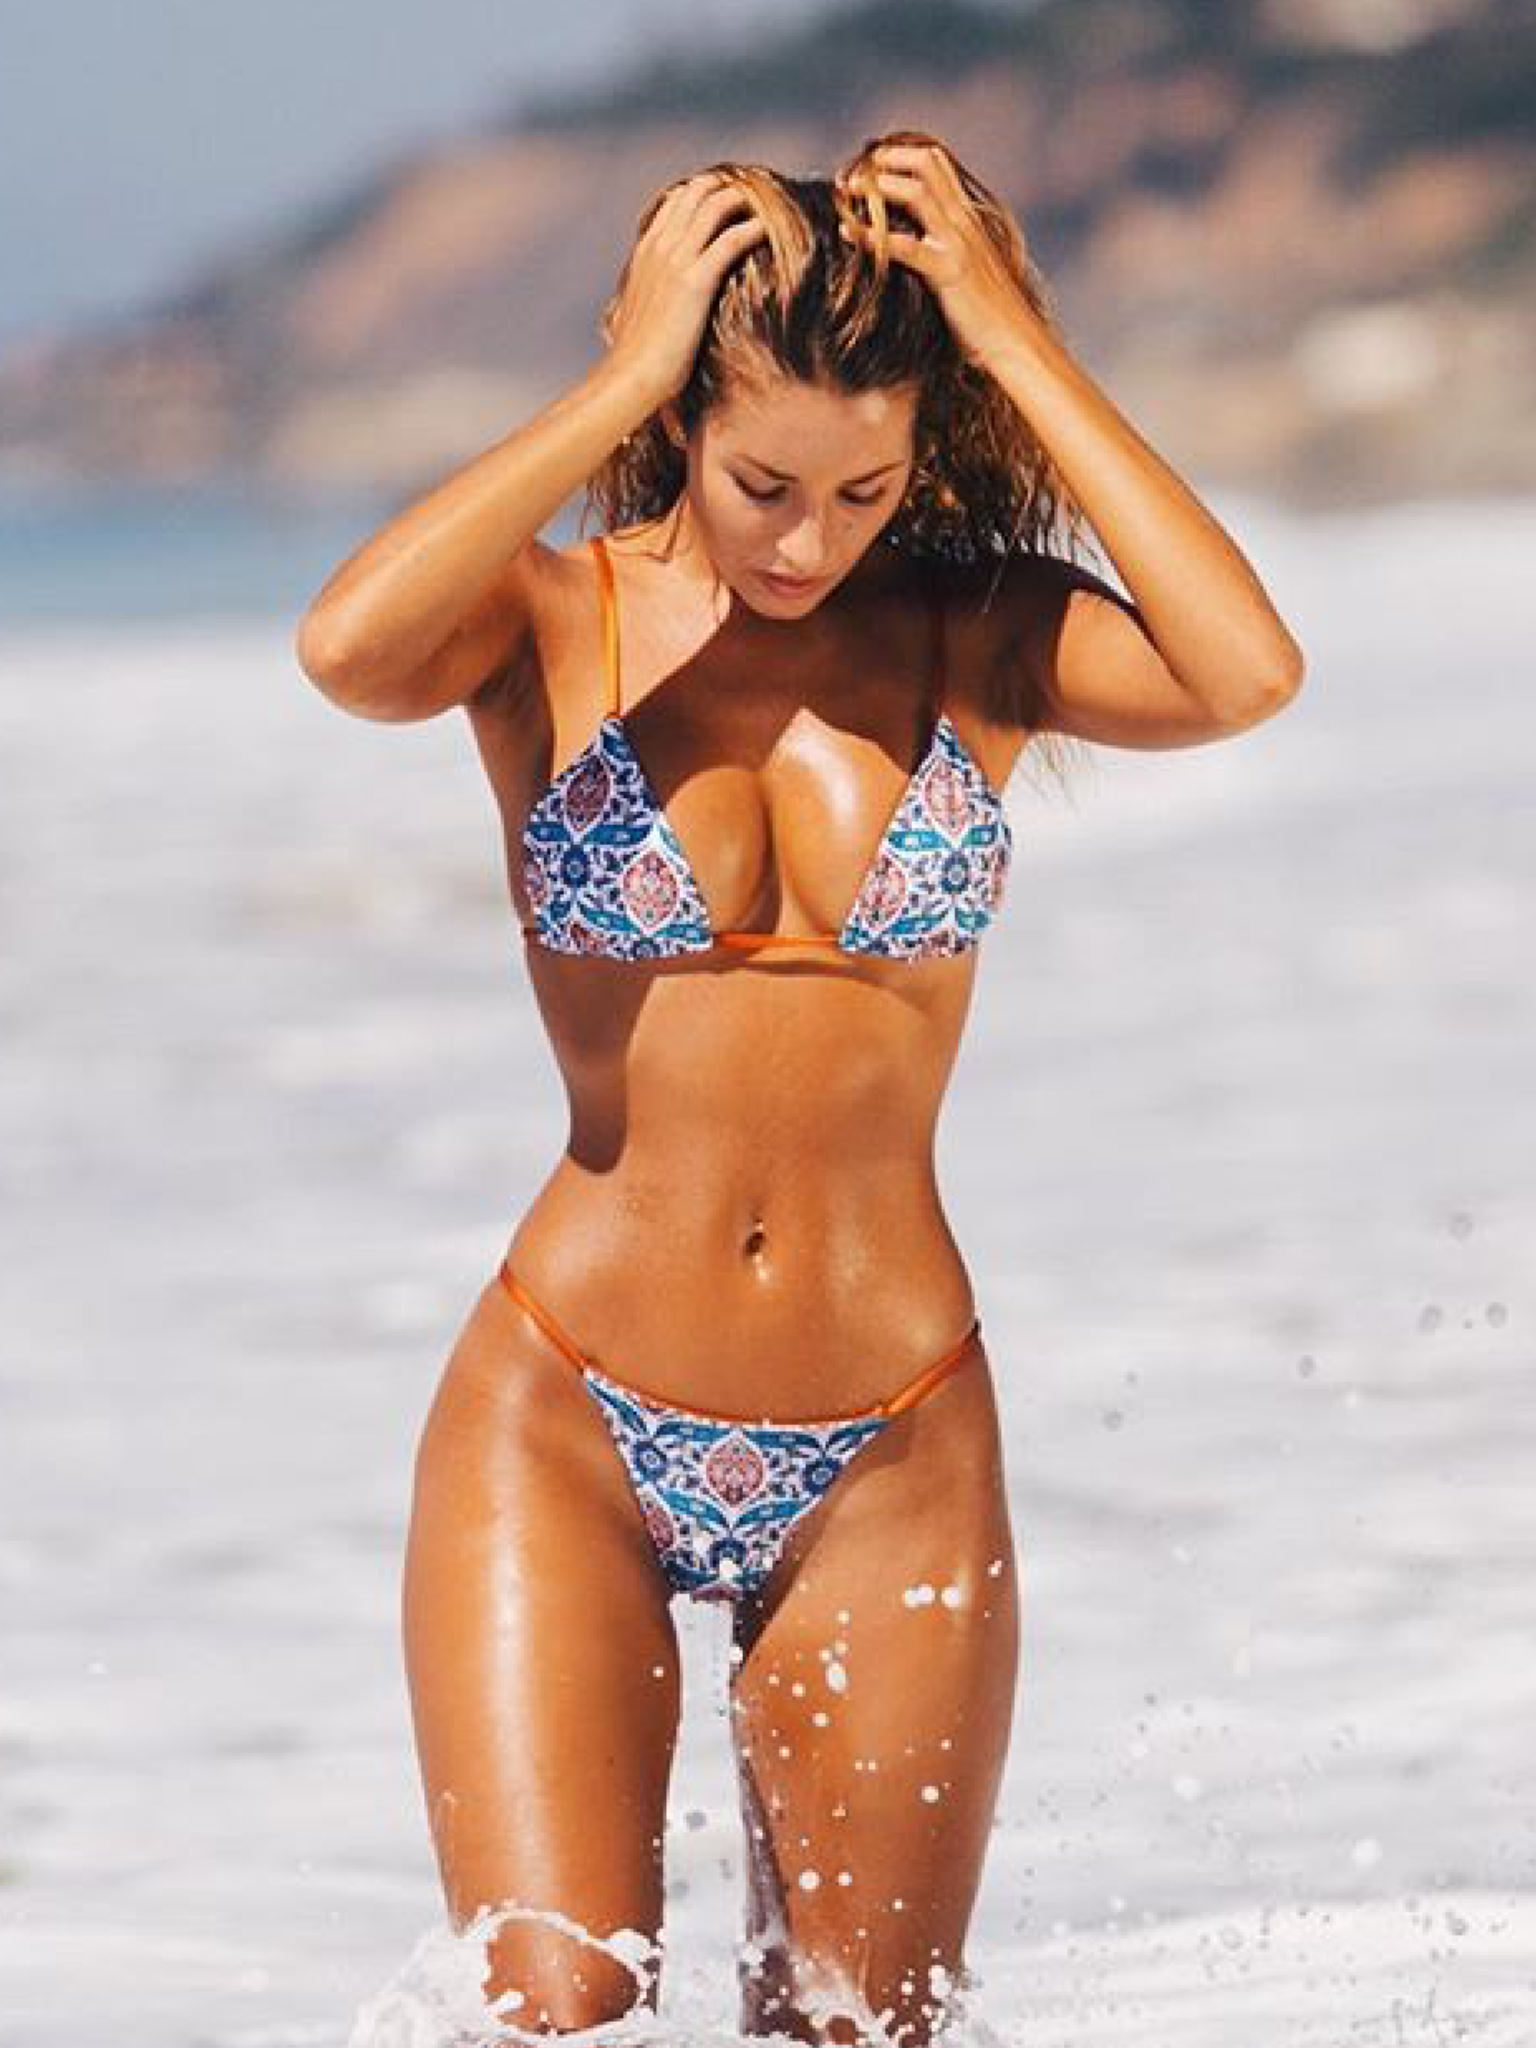 Bikini Babes Bikini Models Sexy Bikini Bikini Girls Mini Bikini Bikinis